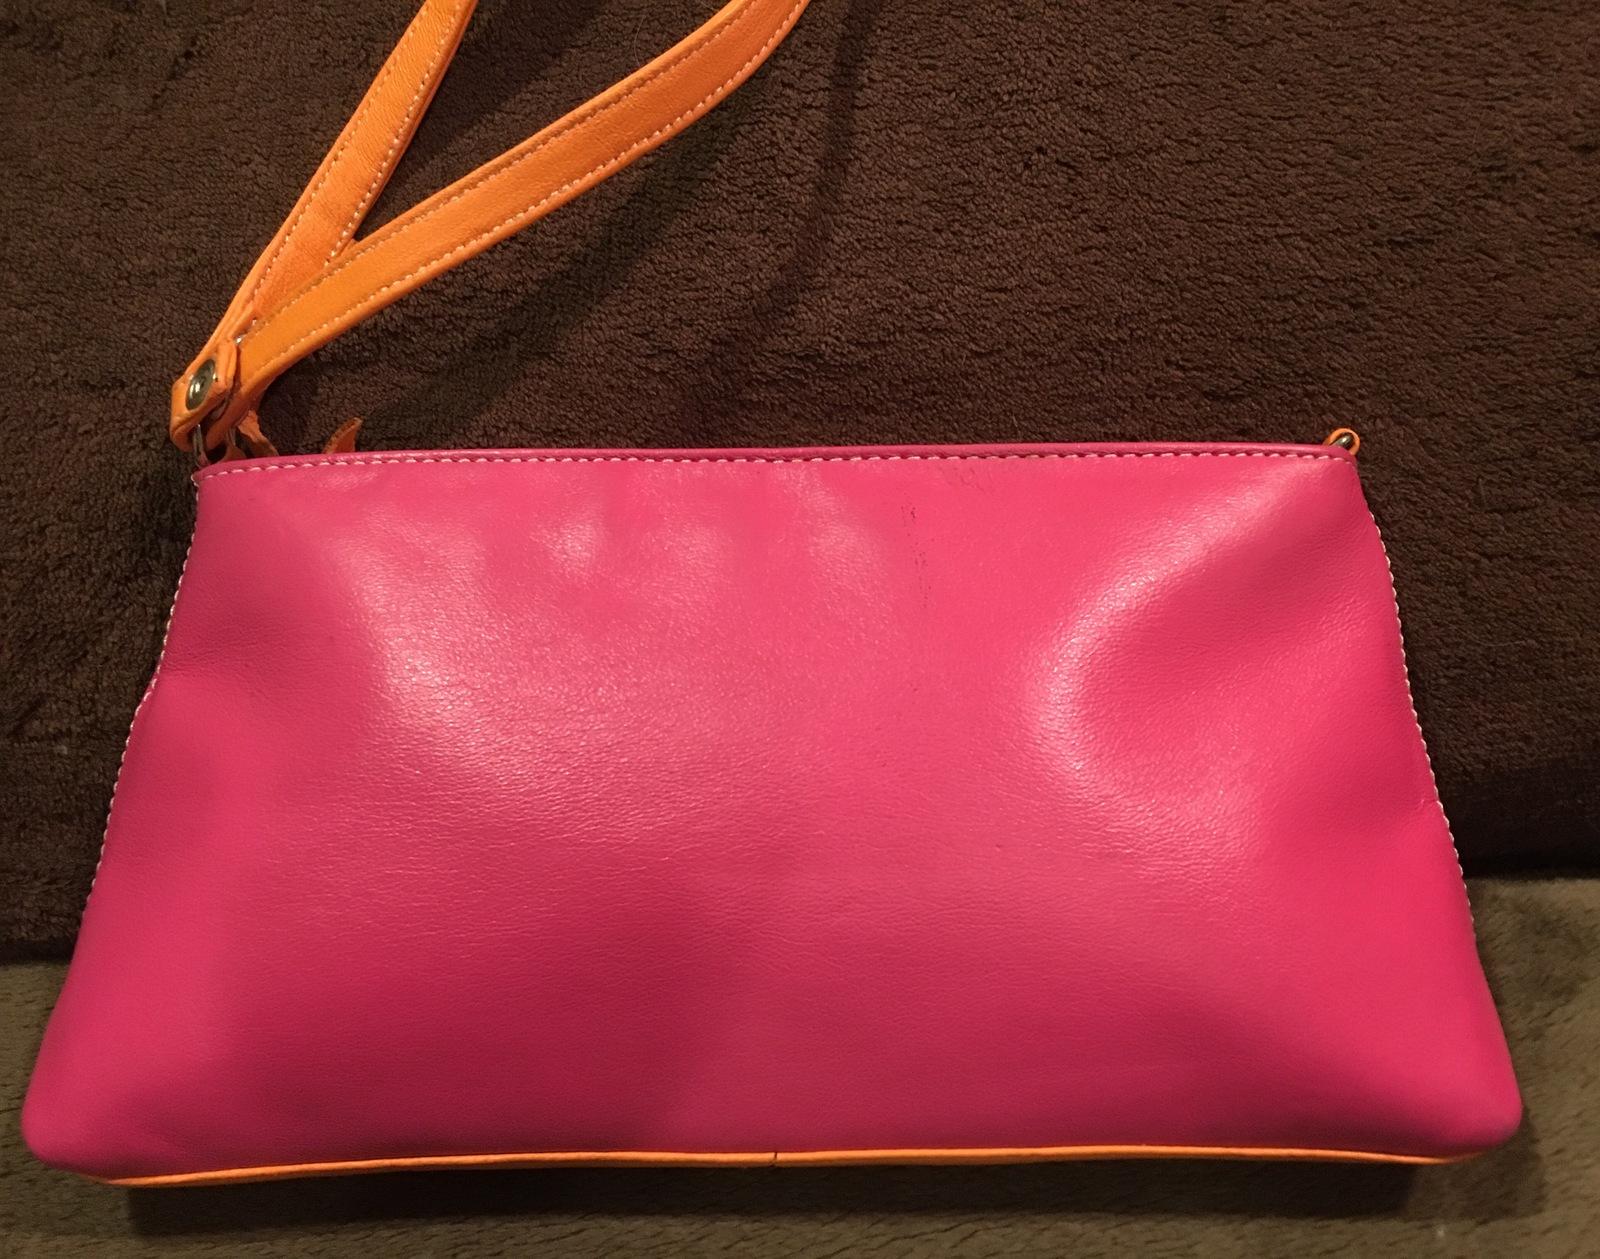 ef8ac142a2 Fiona Lang Leather Handbag Wristlet Clutch and 50 similar items. Image